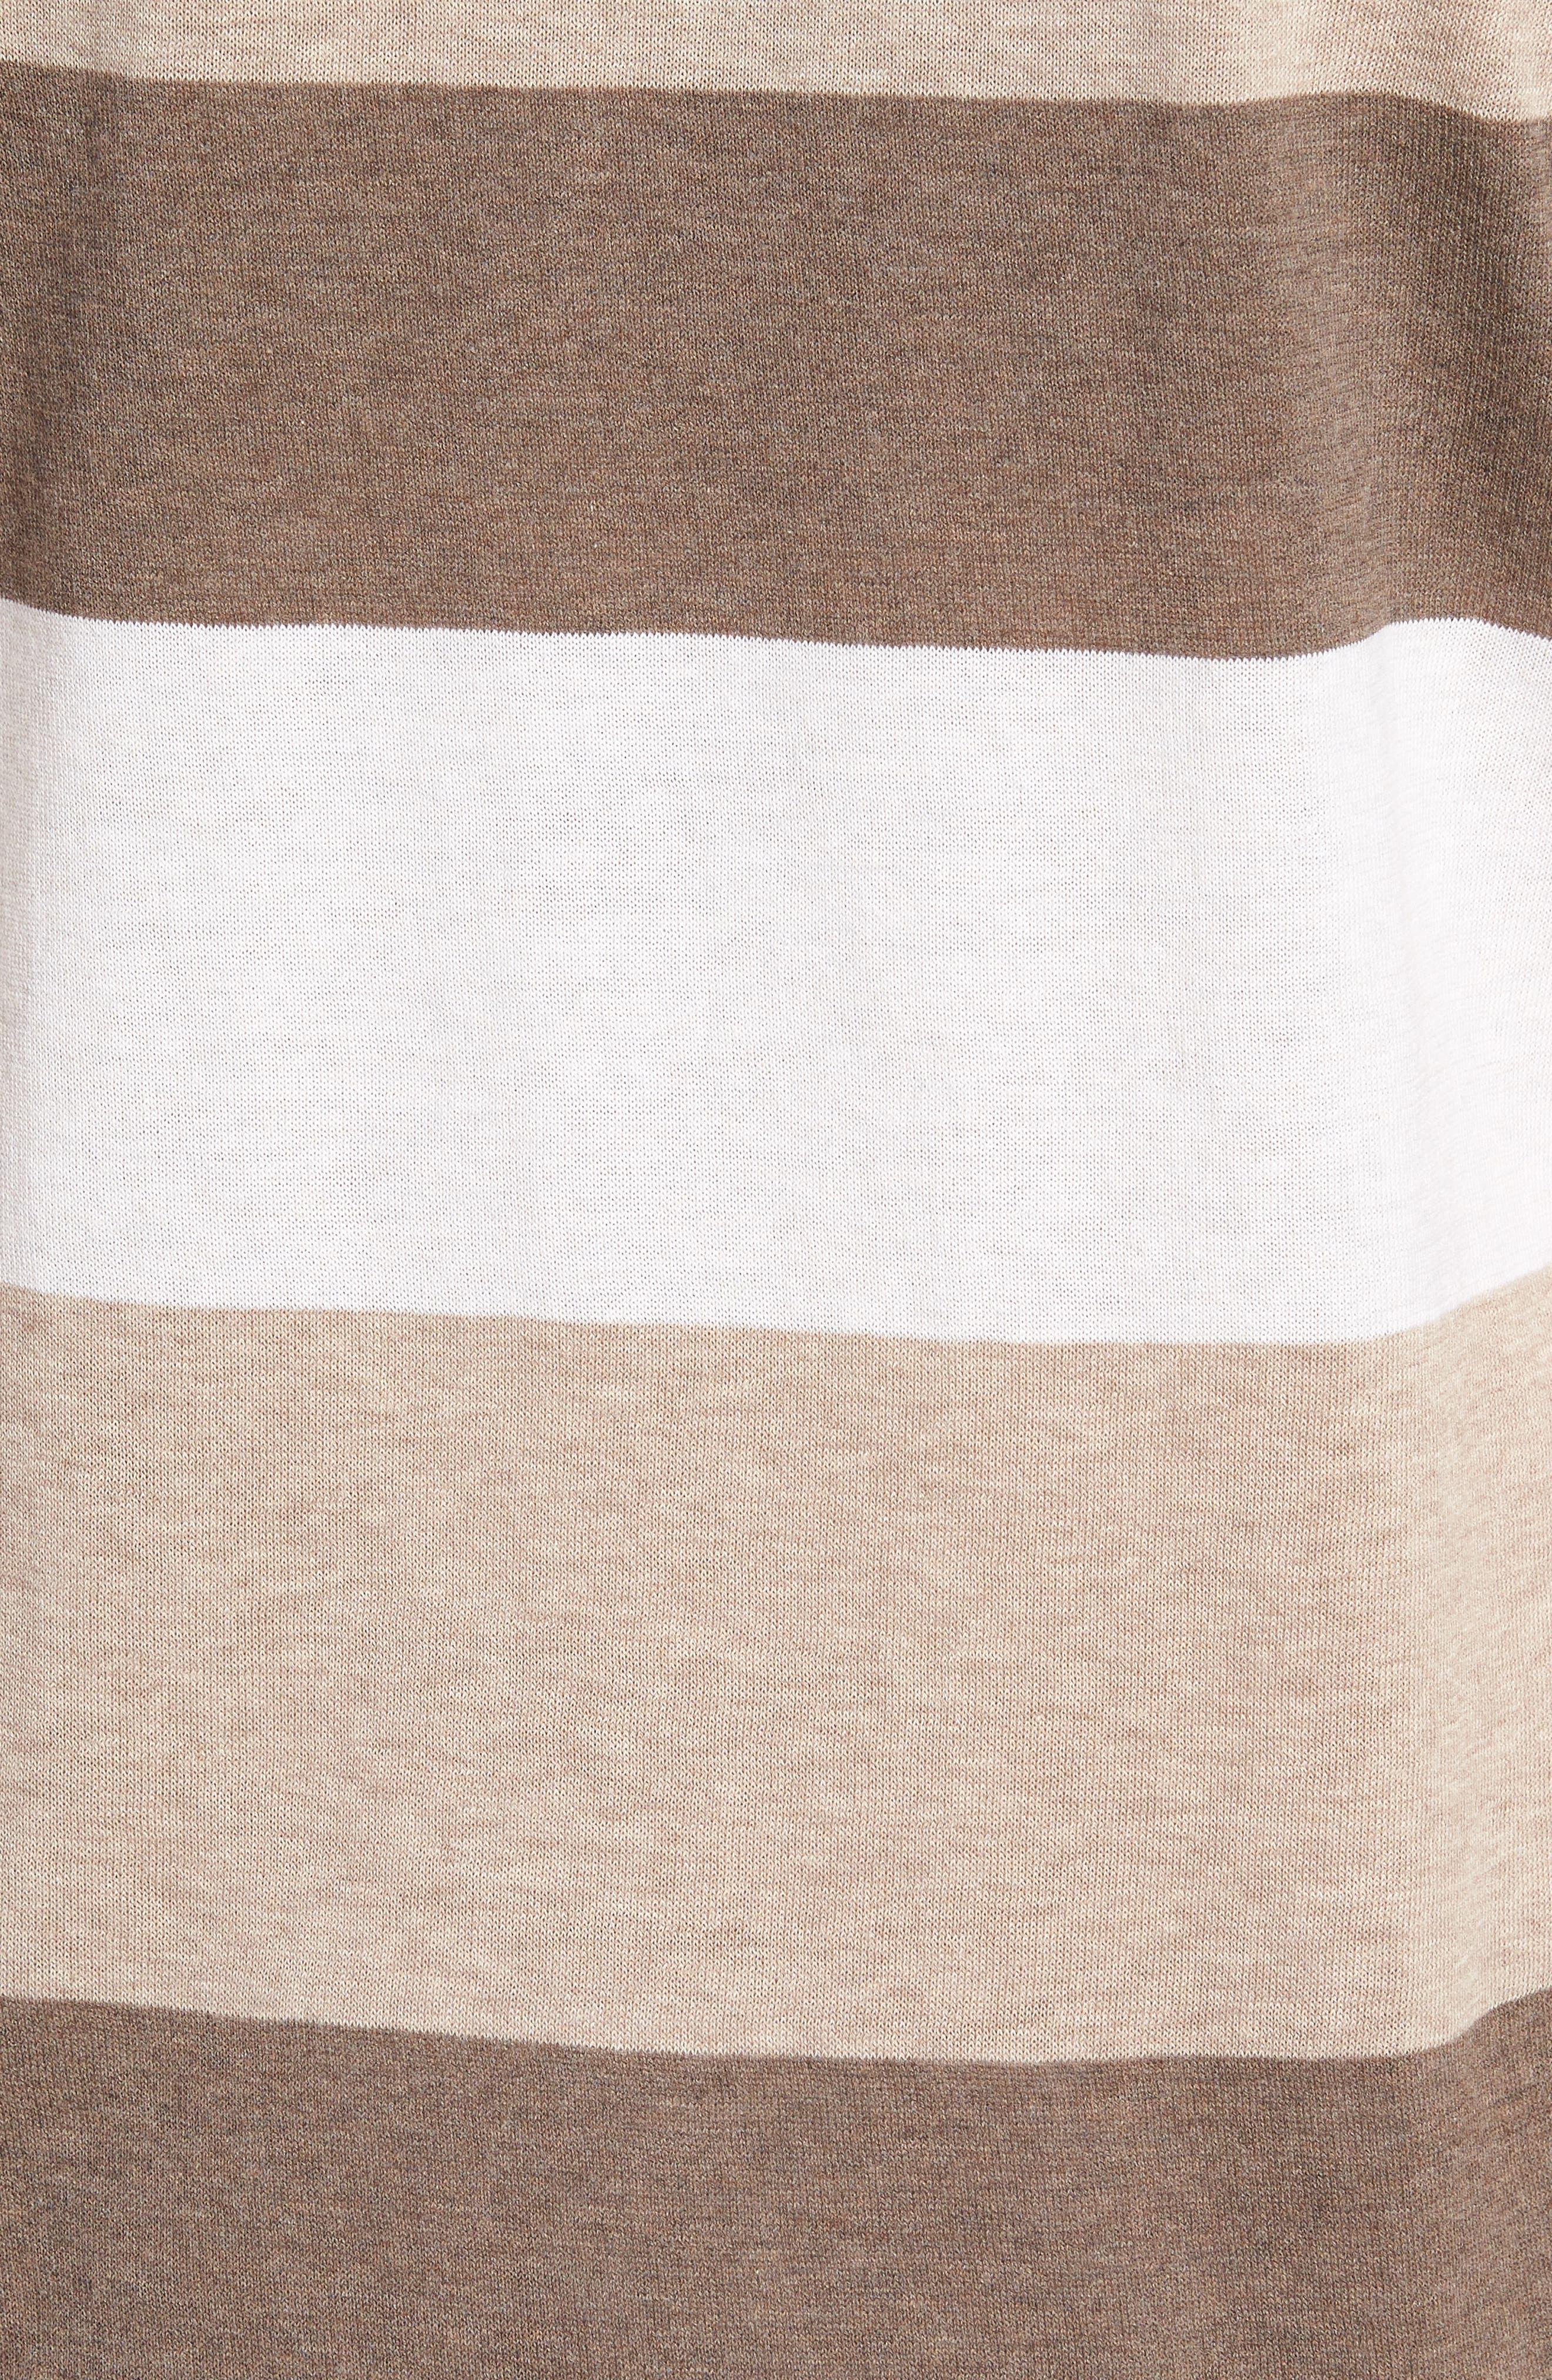 Stripe Polo Shirt,                             Alternate thumbnail 5, color,                             Brown